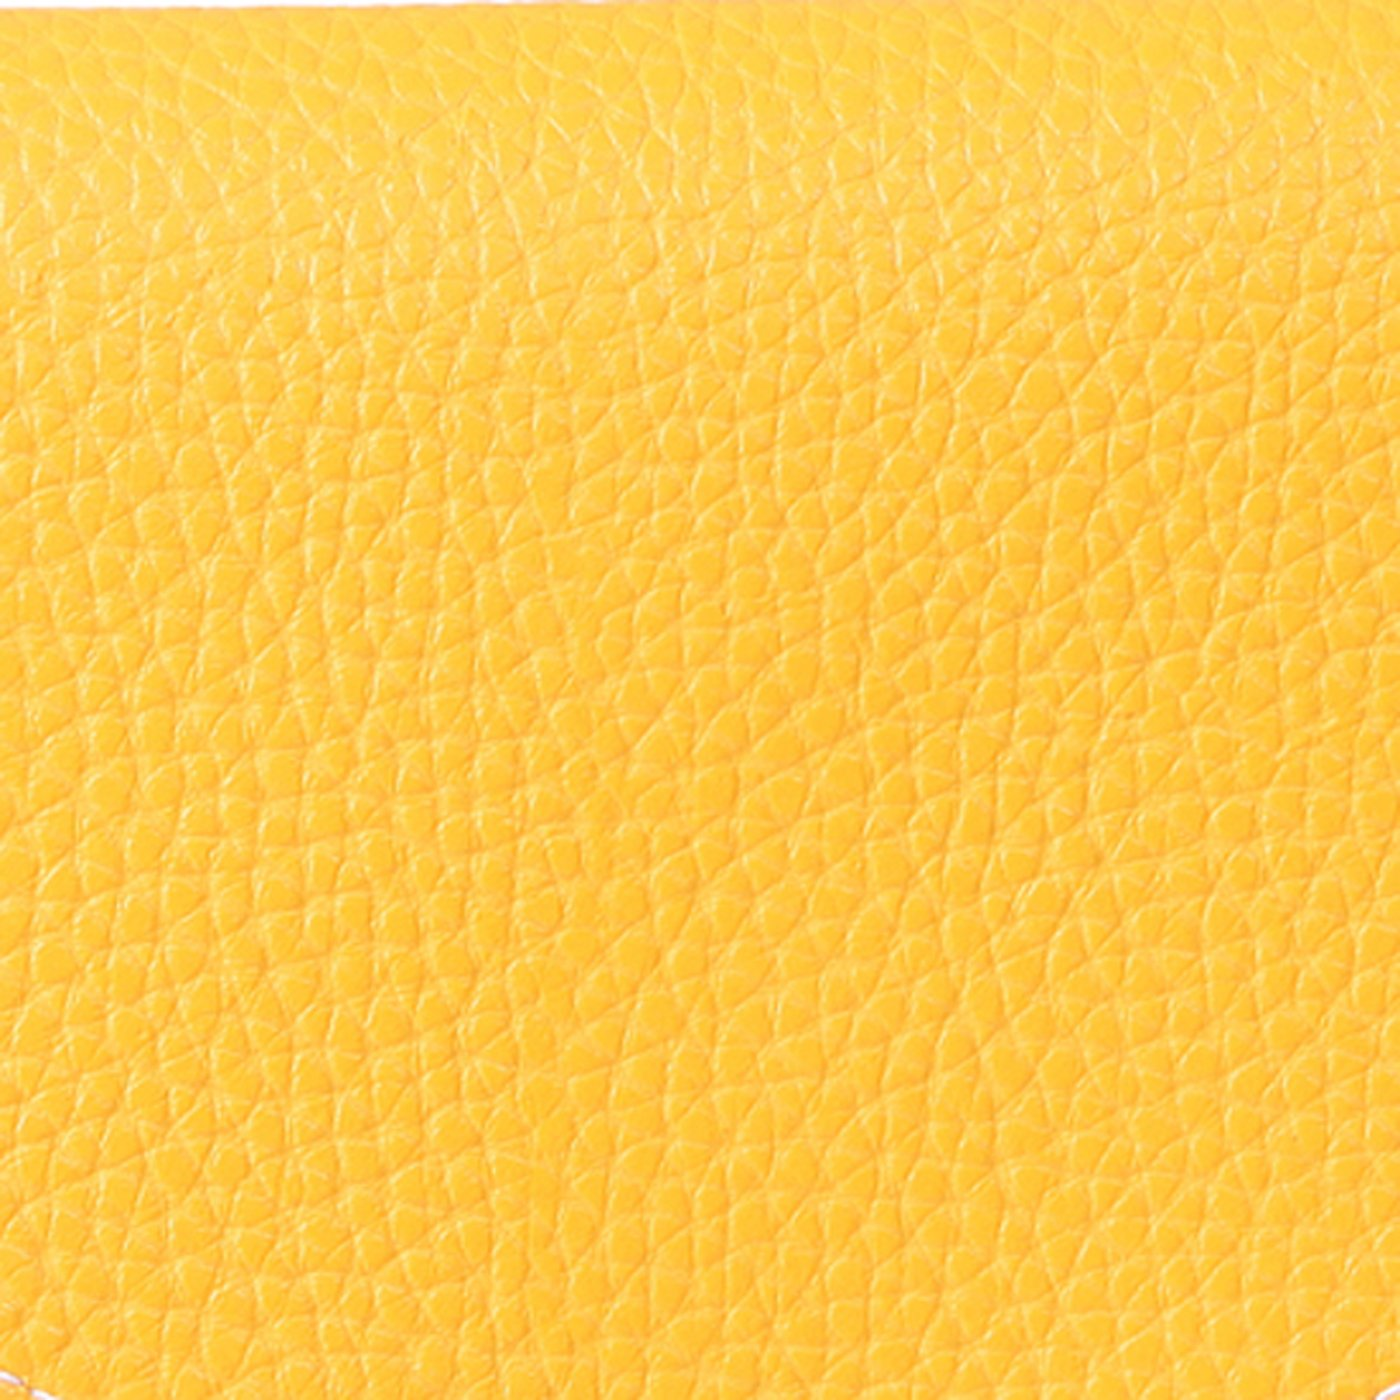 HDE Women's Fashion Cross Body Gold Buckle Purse Vegan Leather Envelope Handbag by HDE (Image #2)